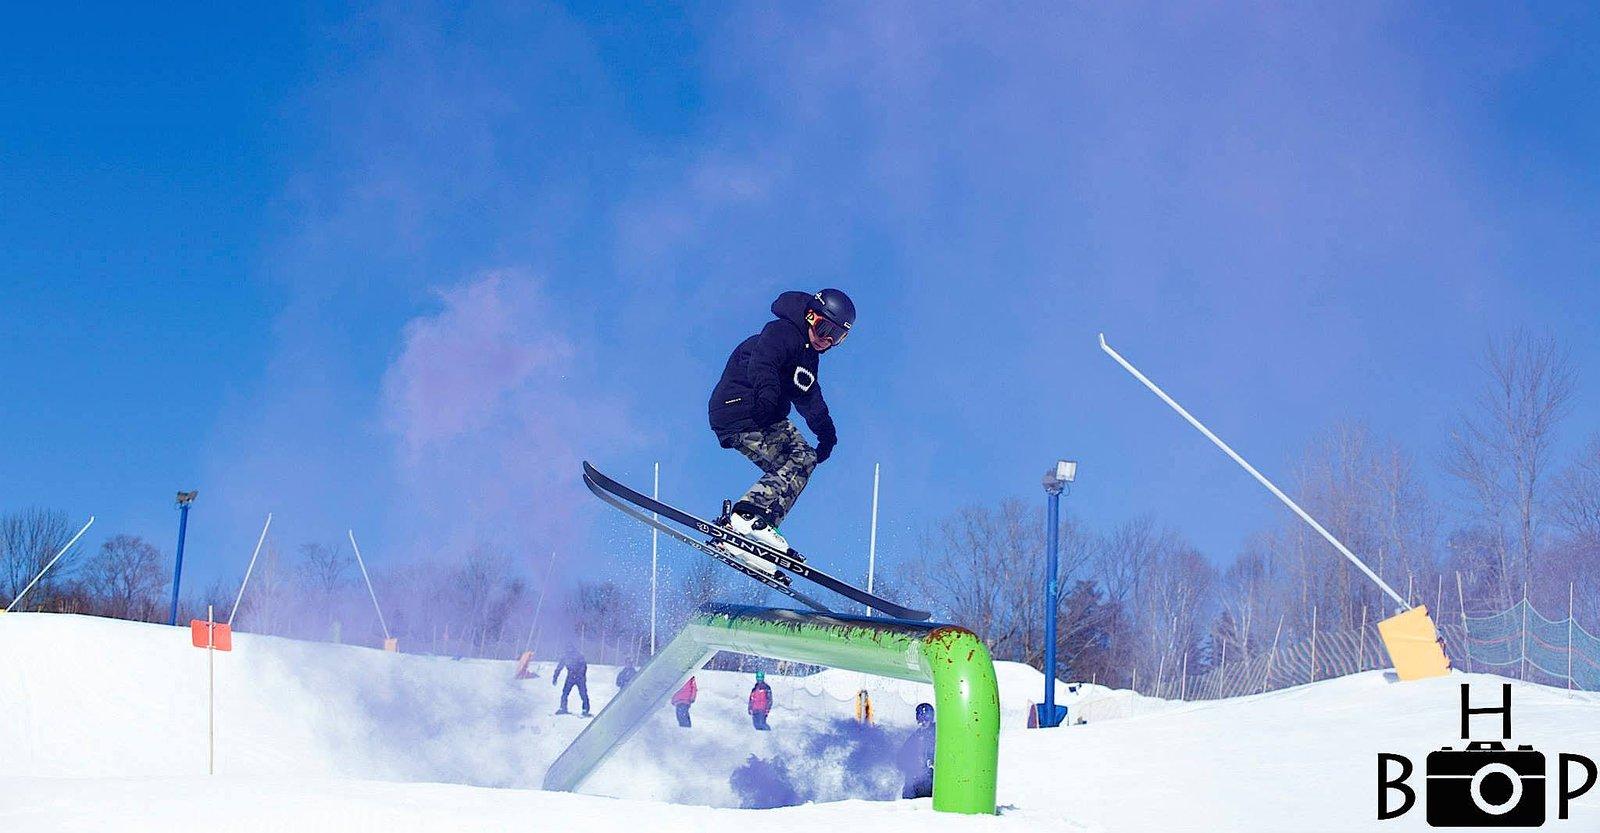 skiing on rail